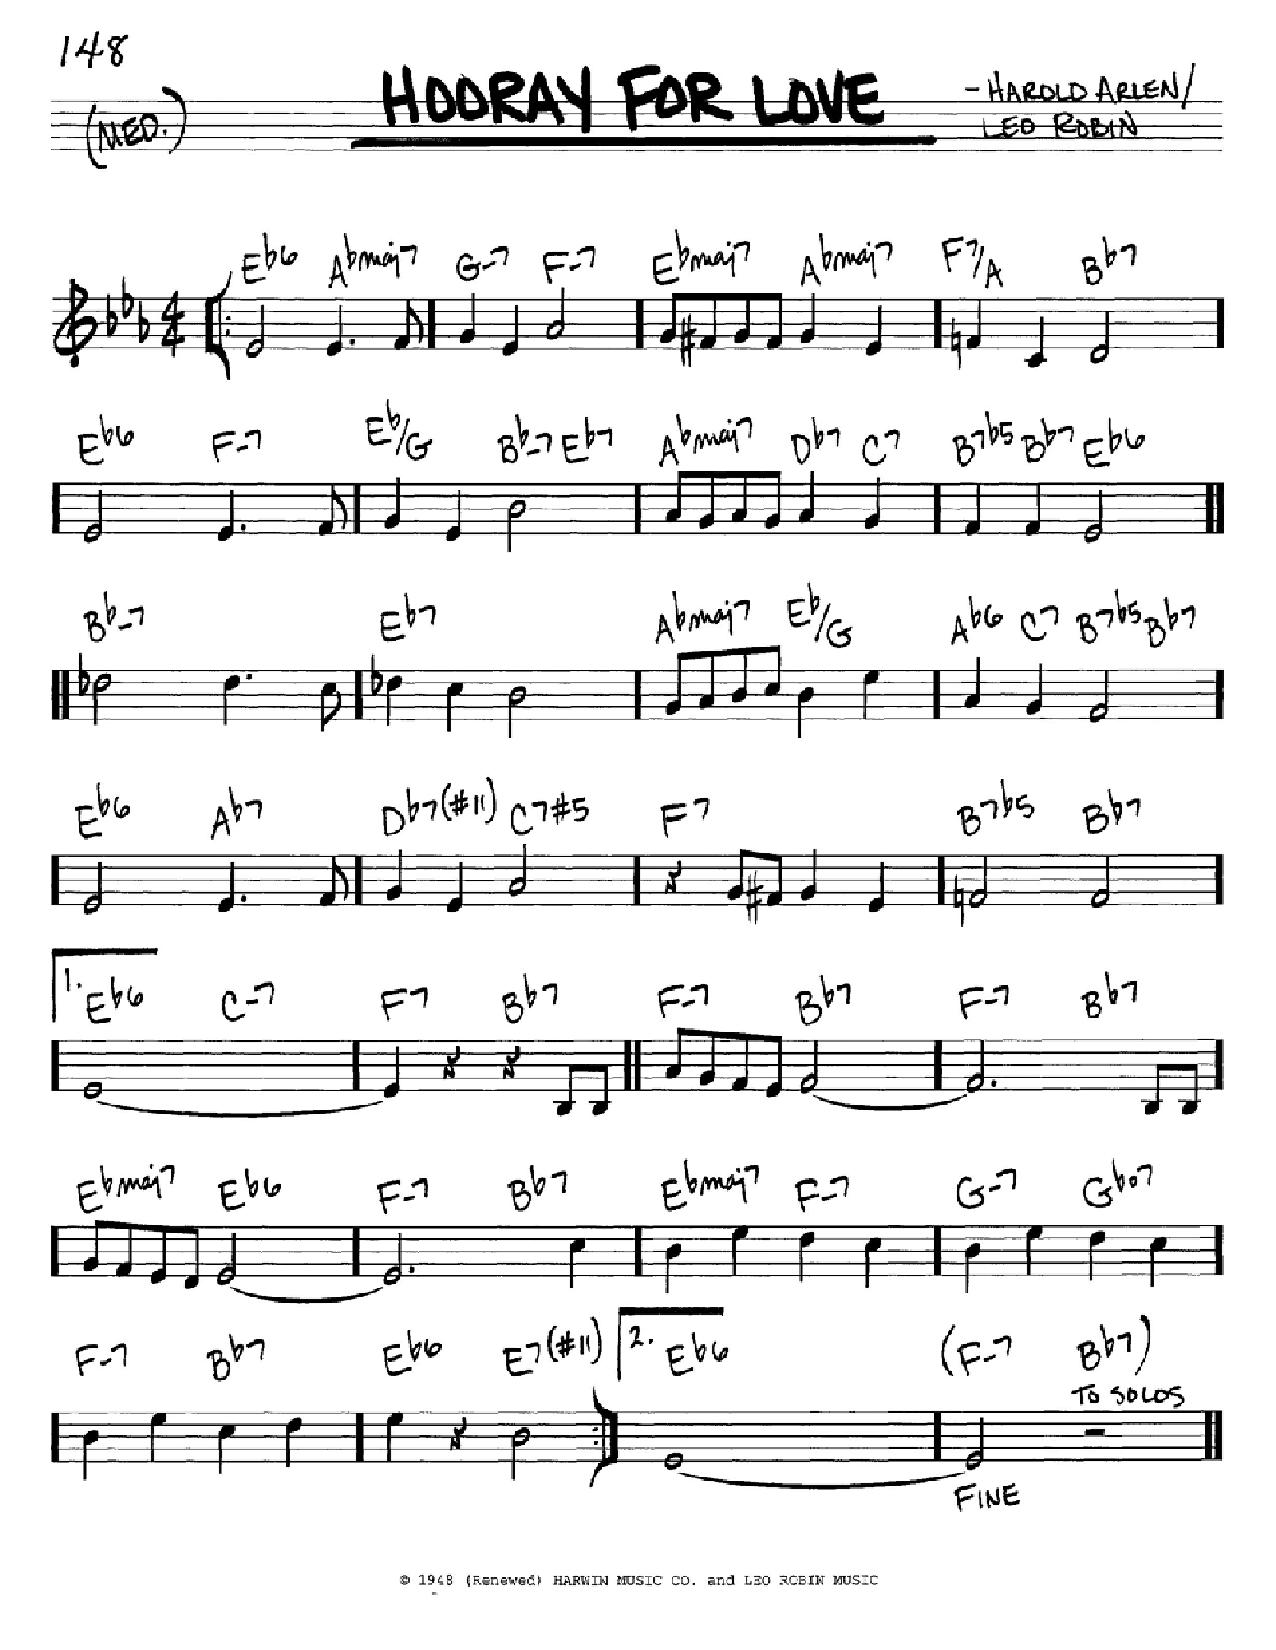 Partition autre Hooray For Love de Harold Arlen - Real Book, Melodie et Accords, Inst. En Do